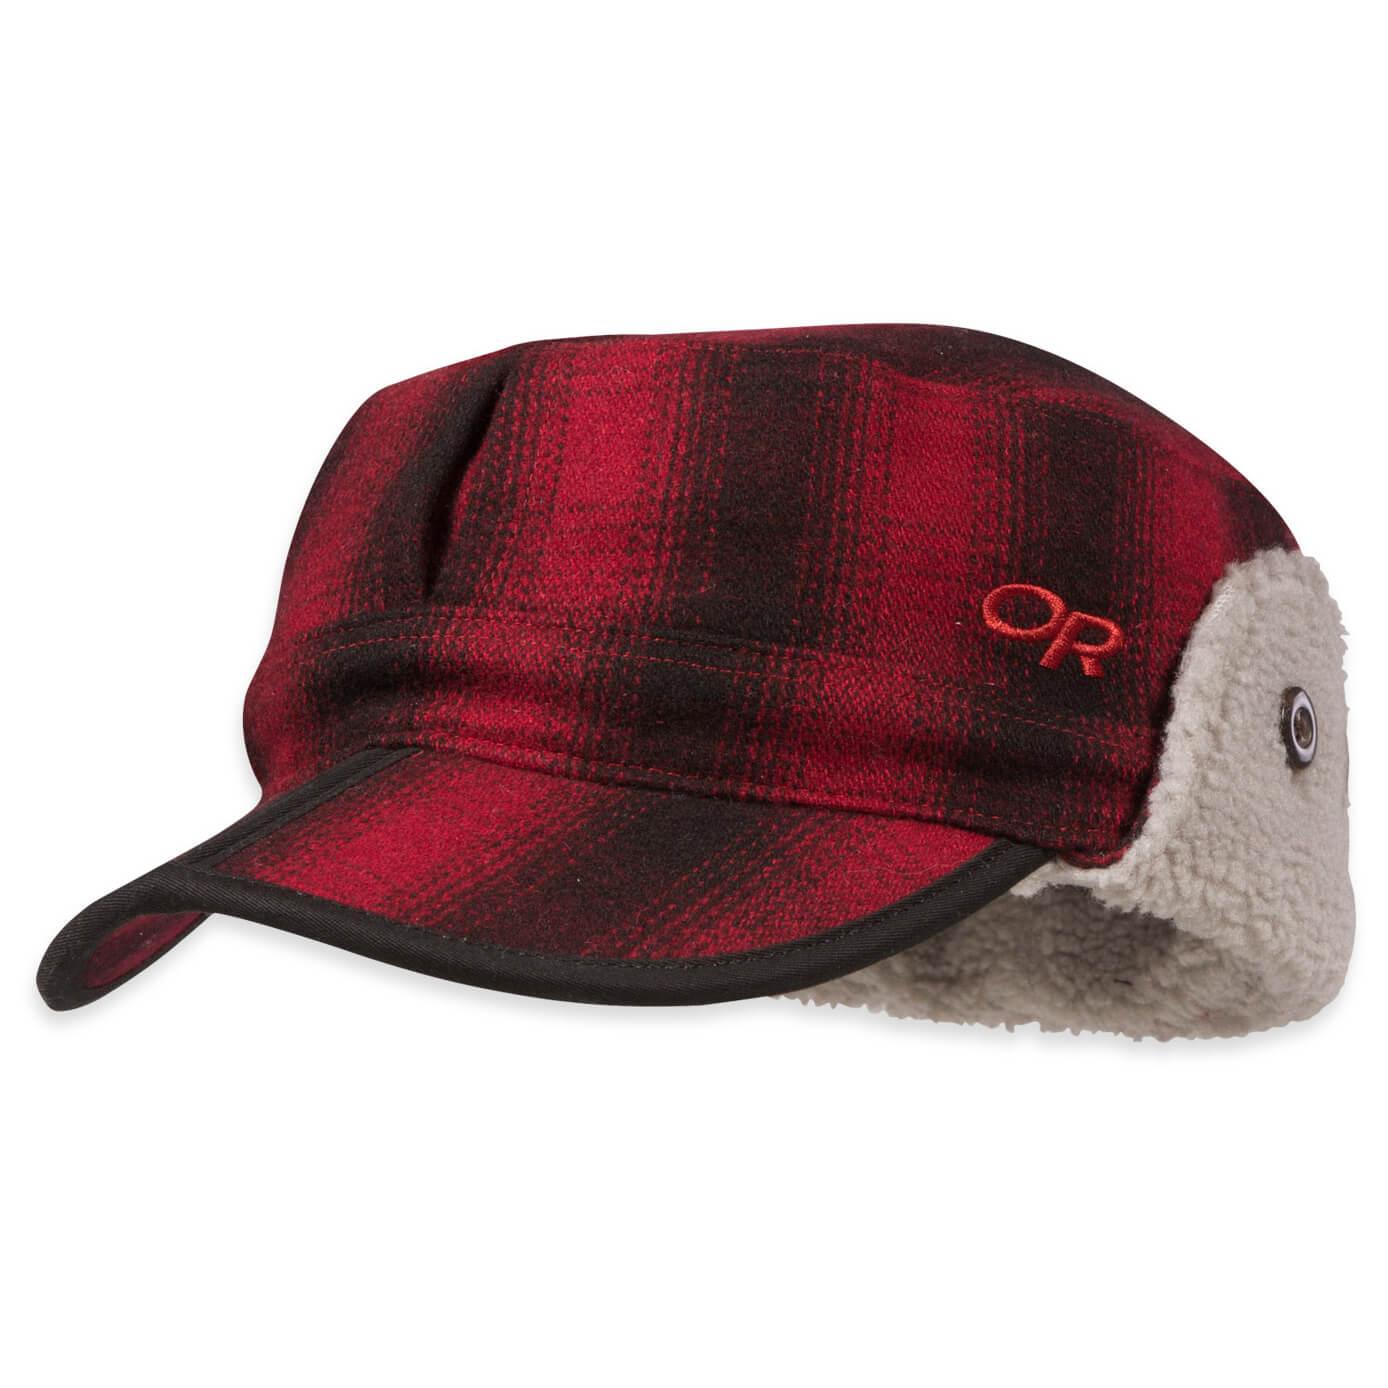 Outdoor Research Yukon Cap Cap Buy Online Bergfreunde Eu